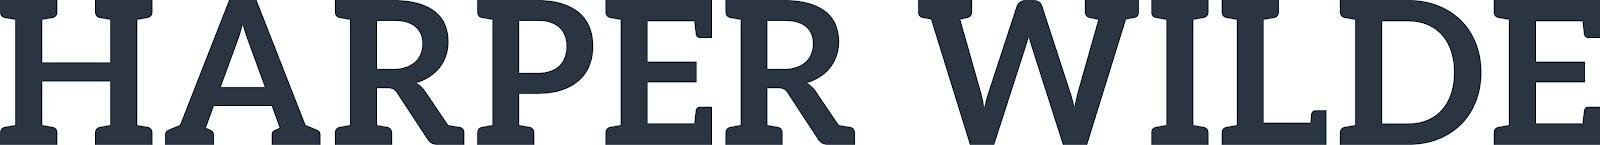 HarperWilde_logo.jpg